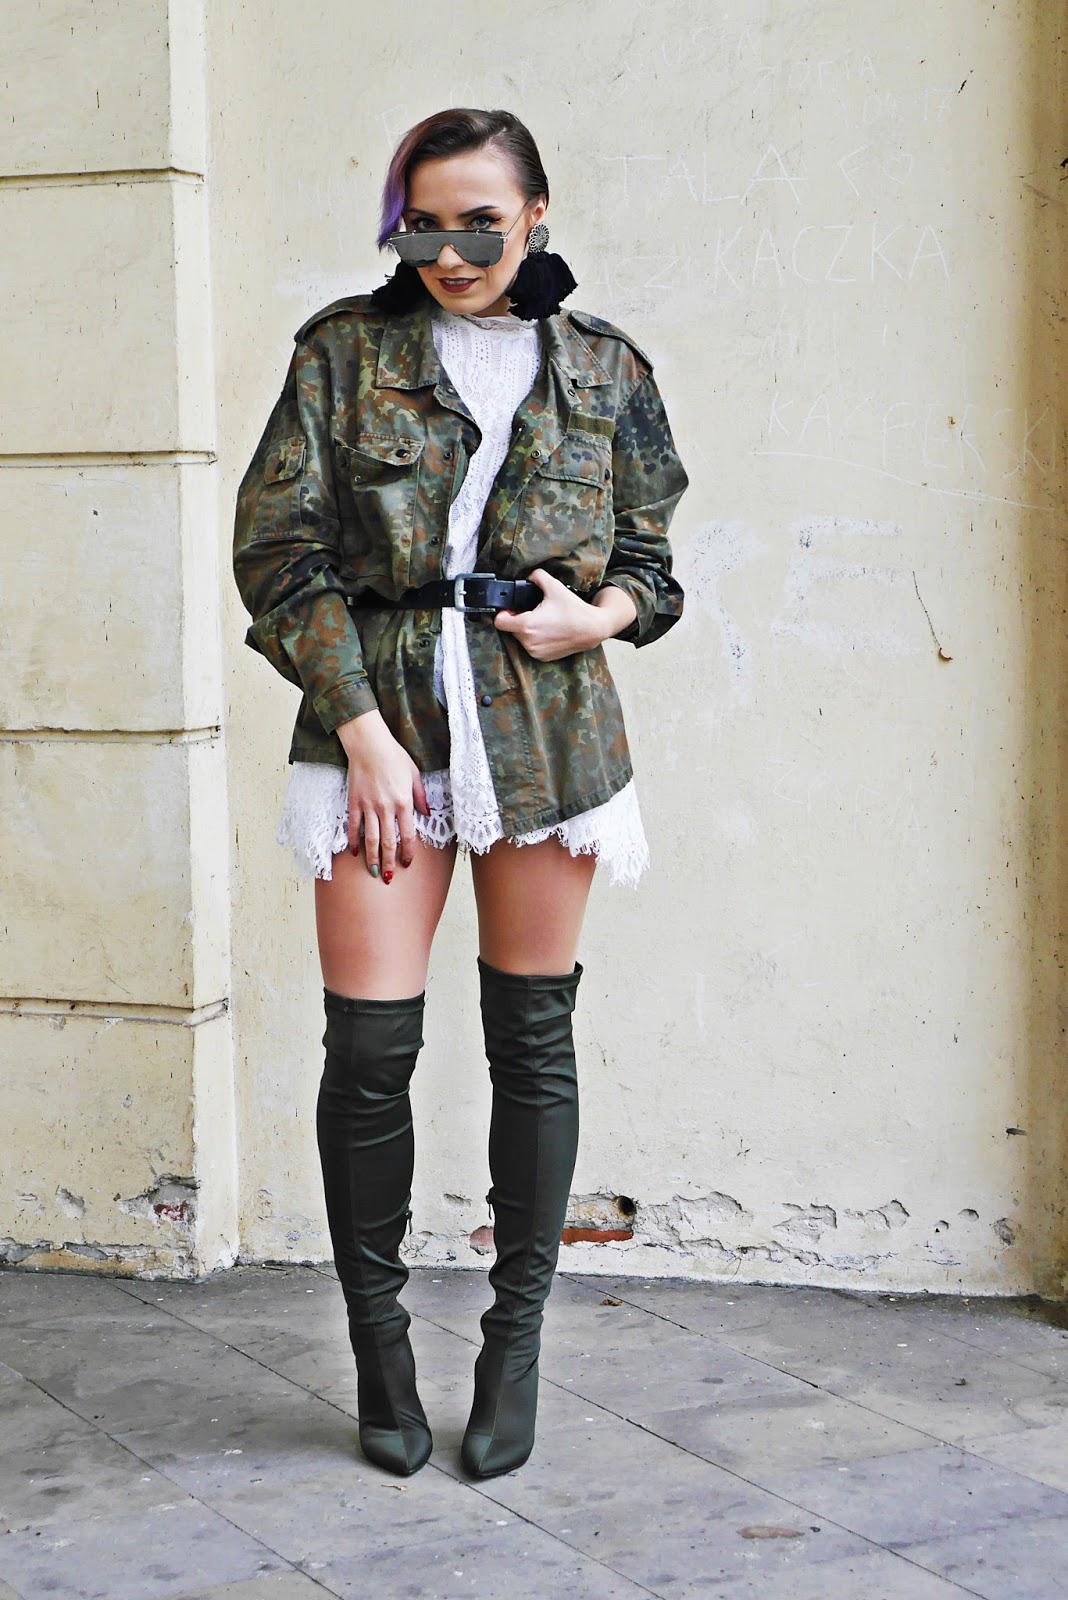 1_moro_jacket_military_white_lace_dress_karyn_blog_modowy_renee_031217b